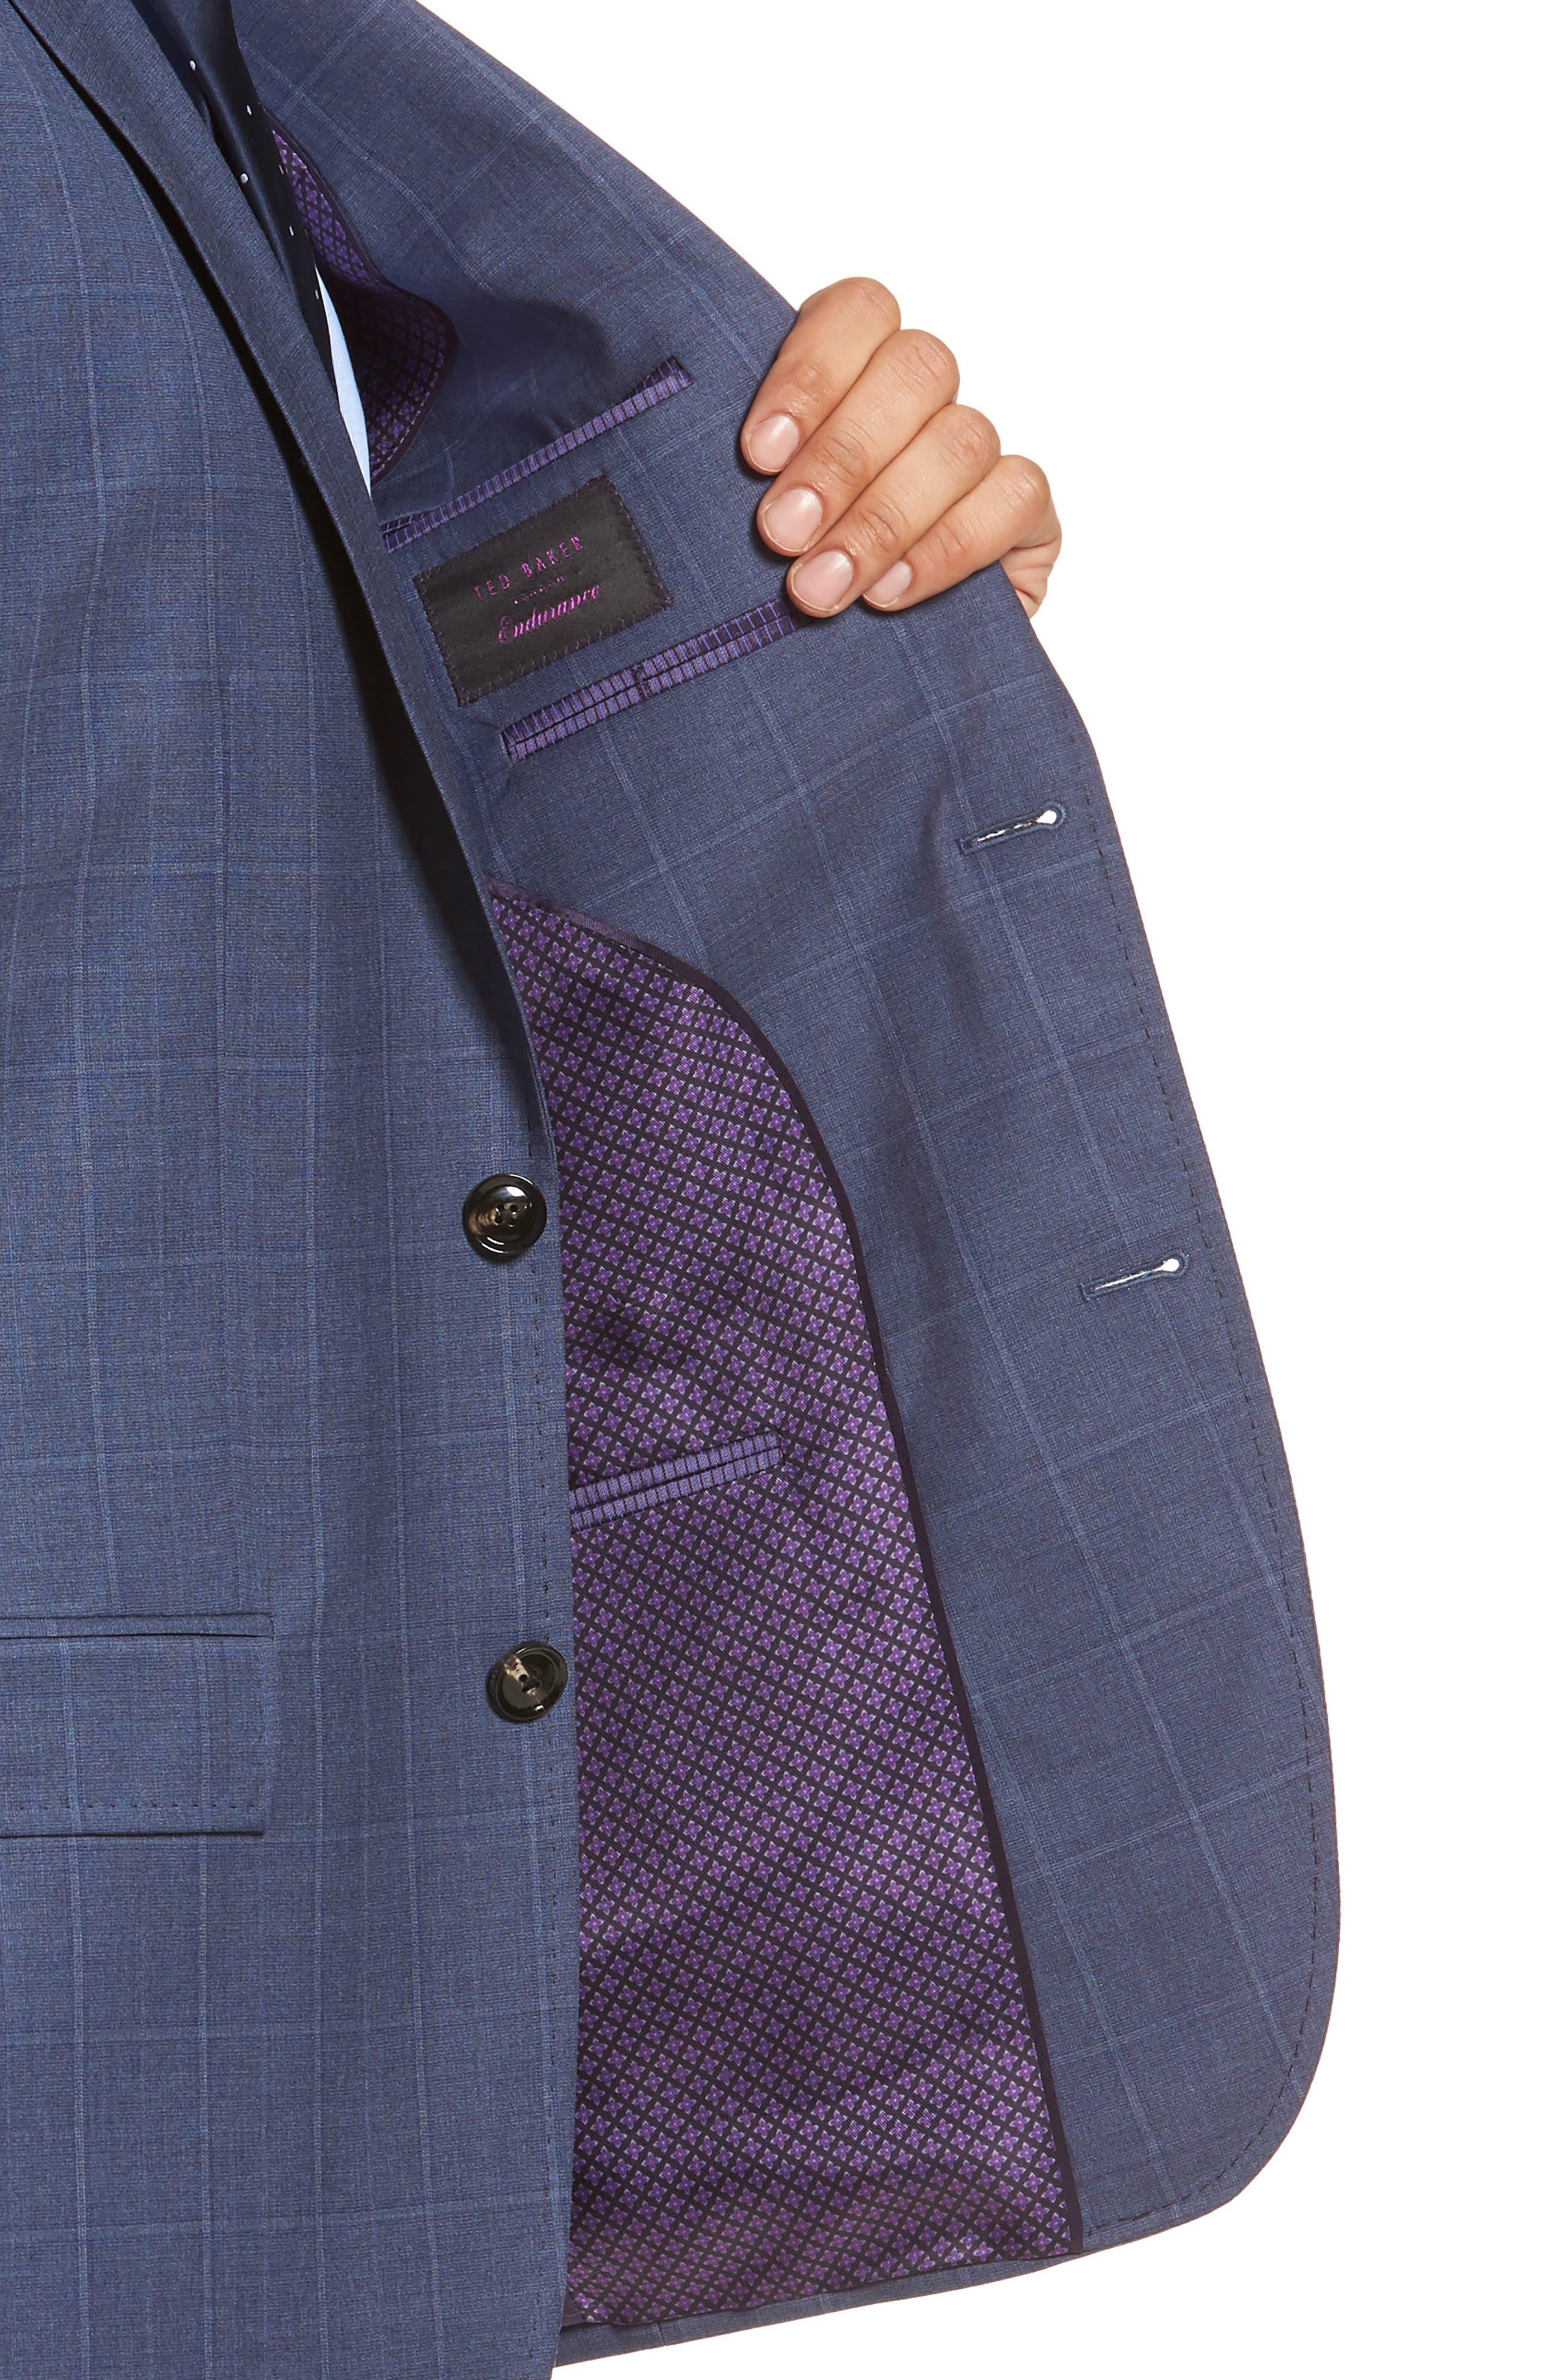 Jay Trim Fit Windowpane Wool Suit,                             Alternate thumbnail 4, color,                             420